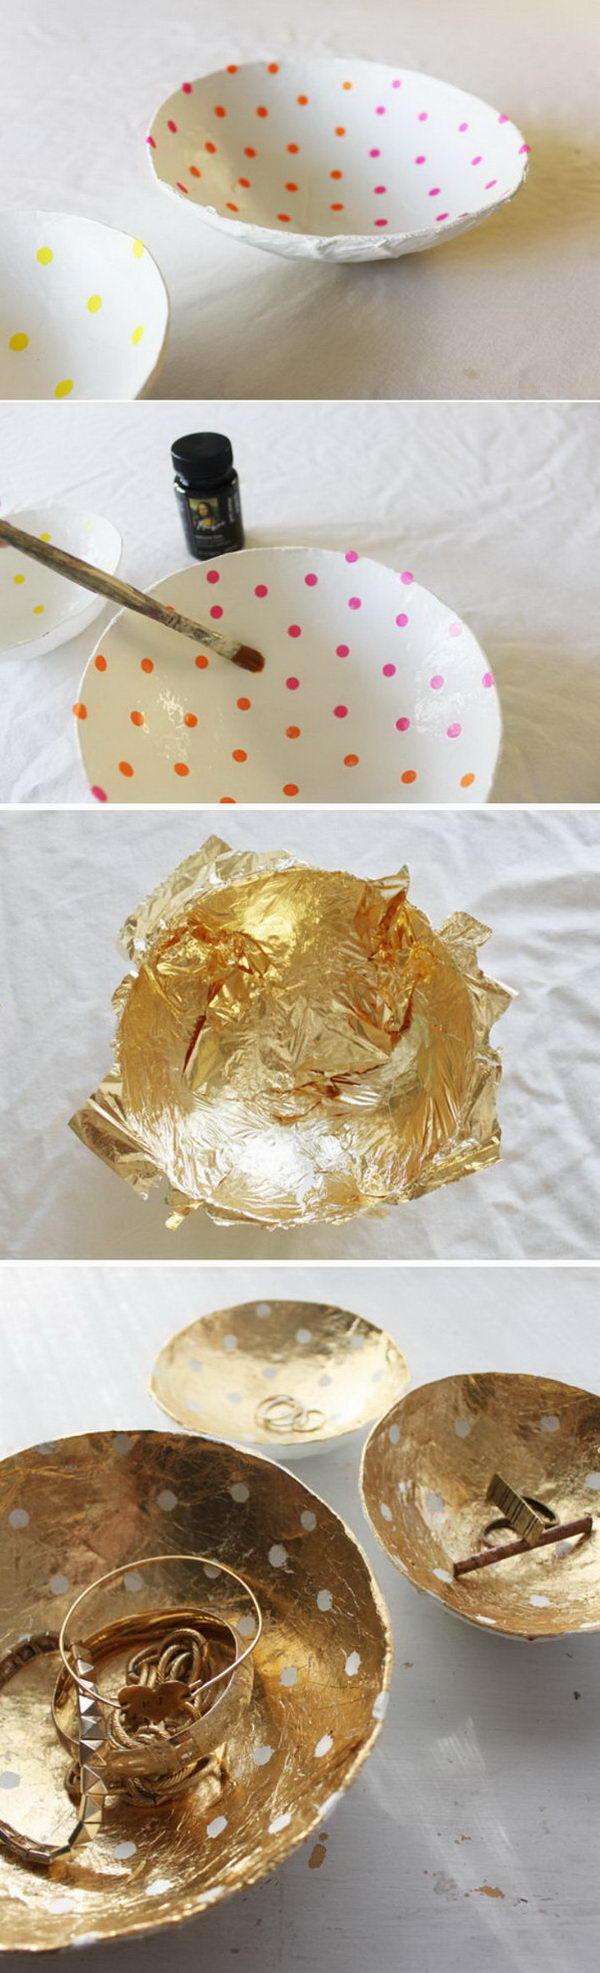 DIY Gold Leaf Paper Mache Bowls.